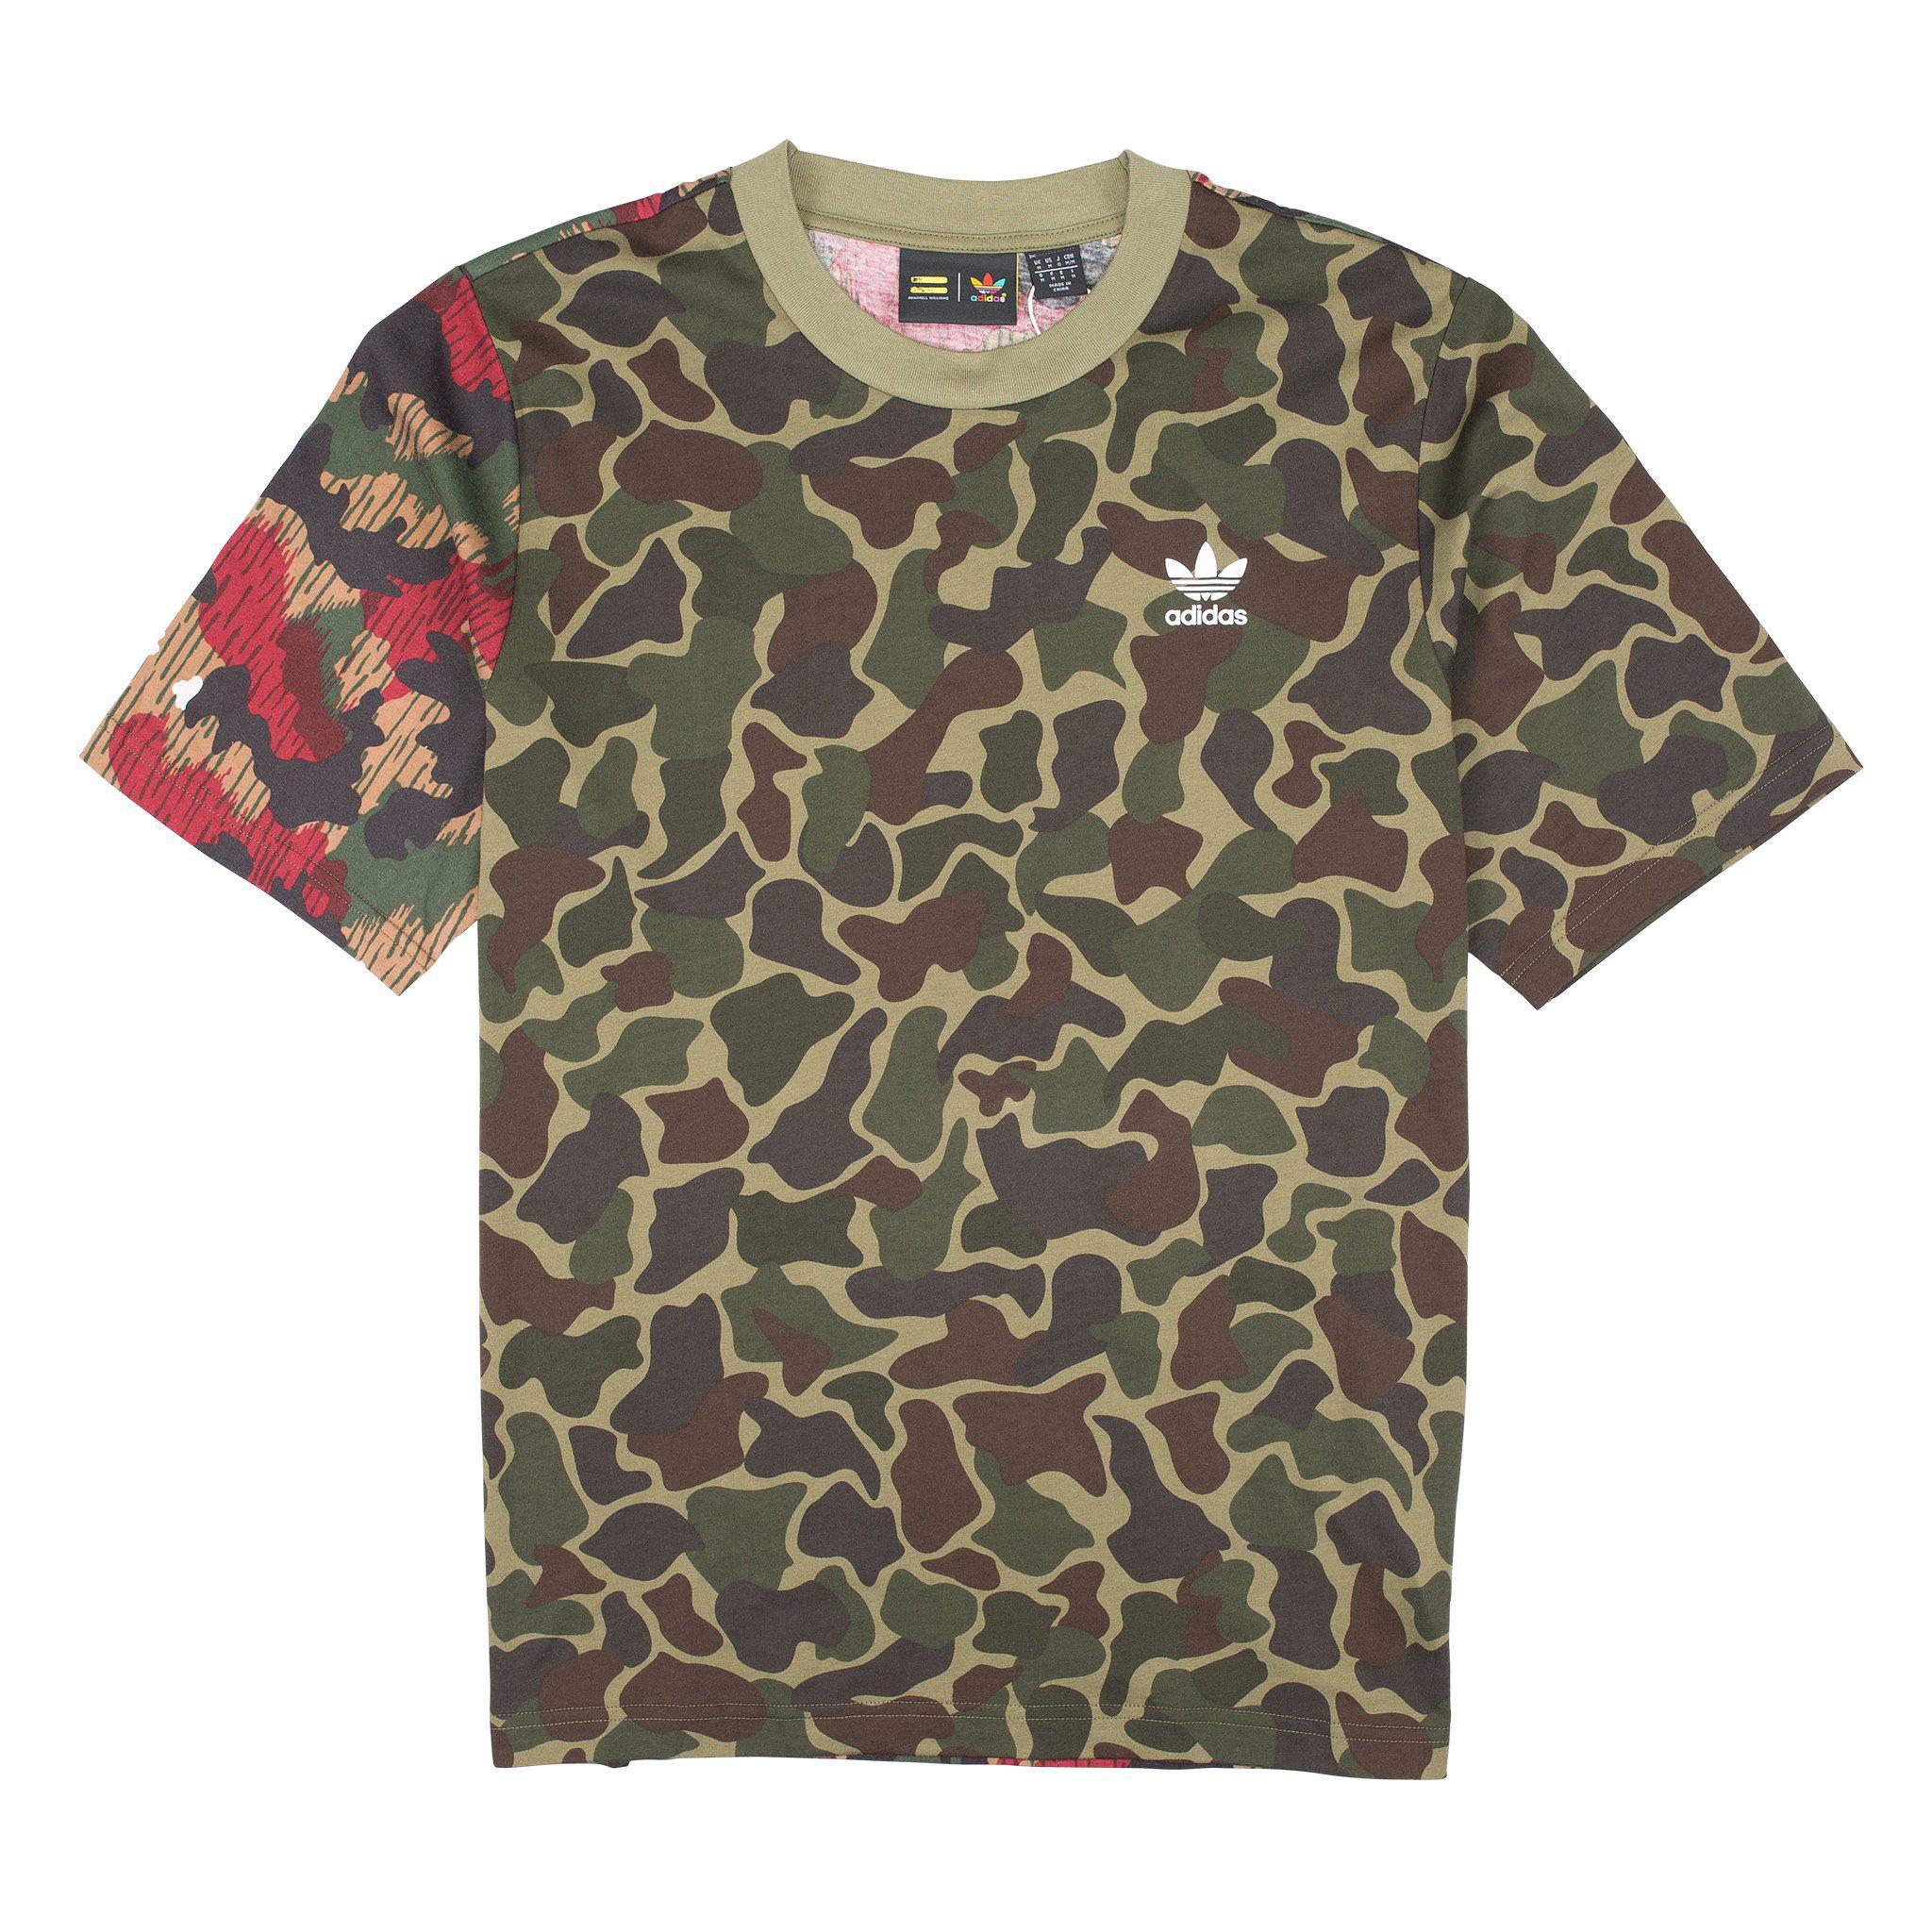 0e96d63321442 Lyst - adidas Originals Hu Hiking Boxy T-shirt for Men